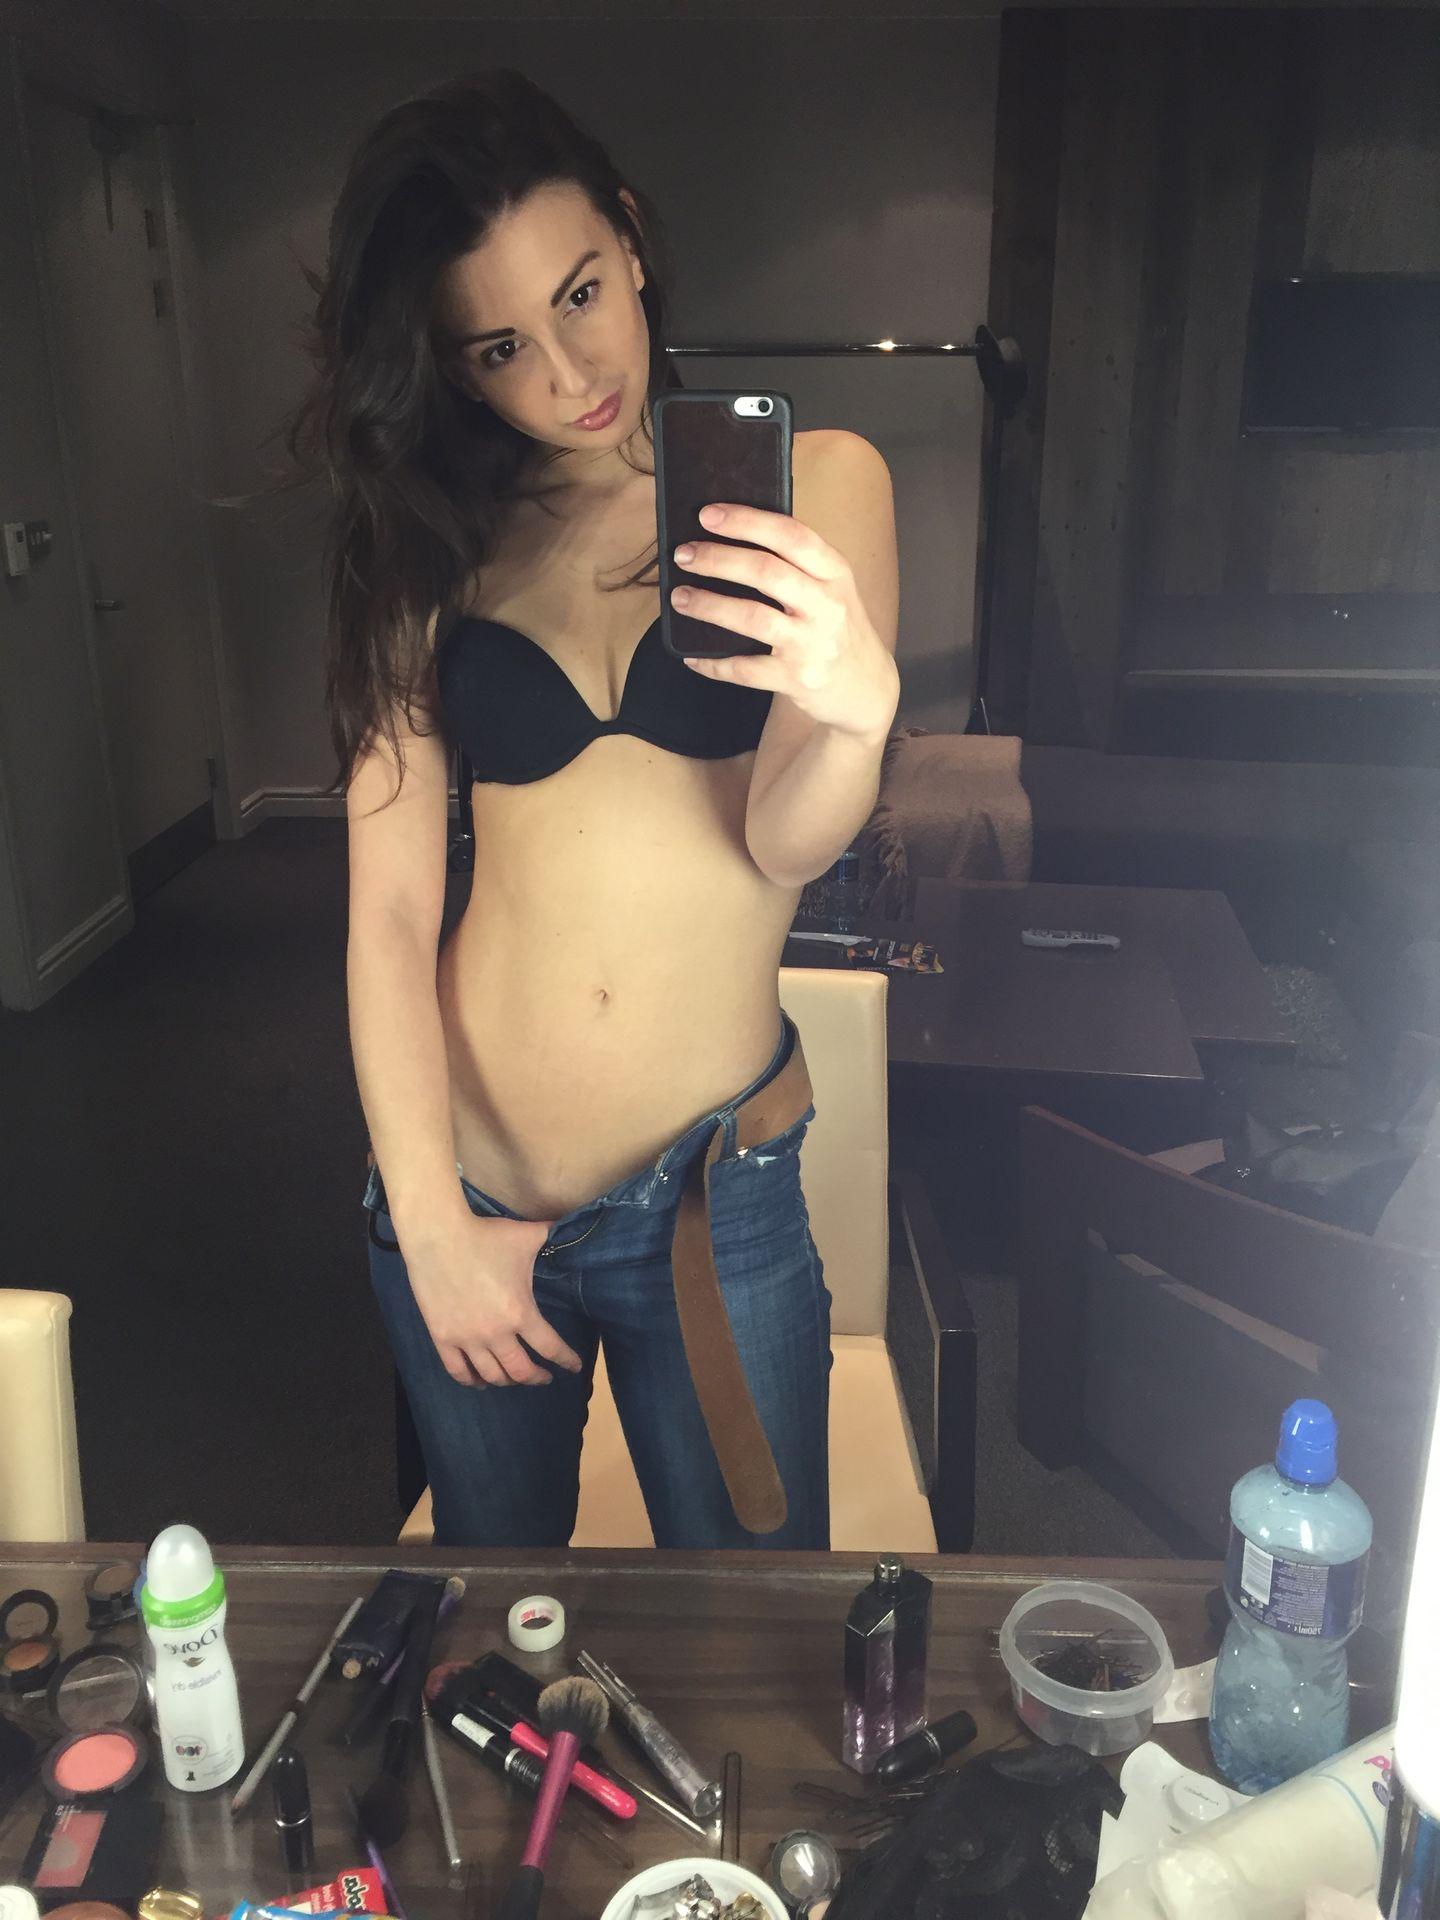 Zizi Strallen Nude Leaked The Fappening 0032